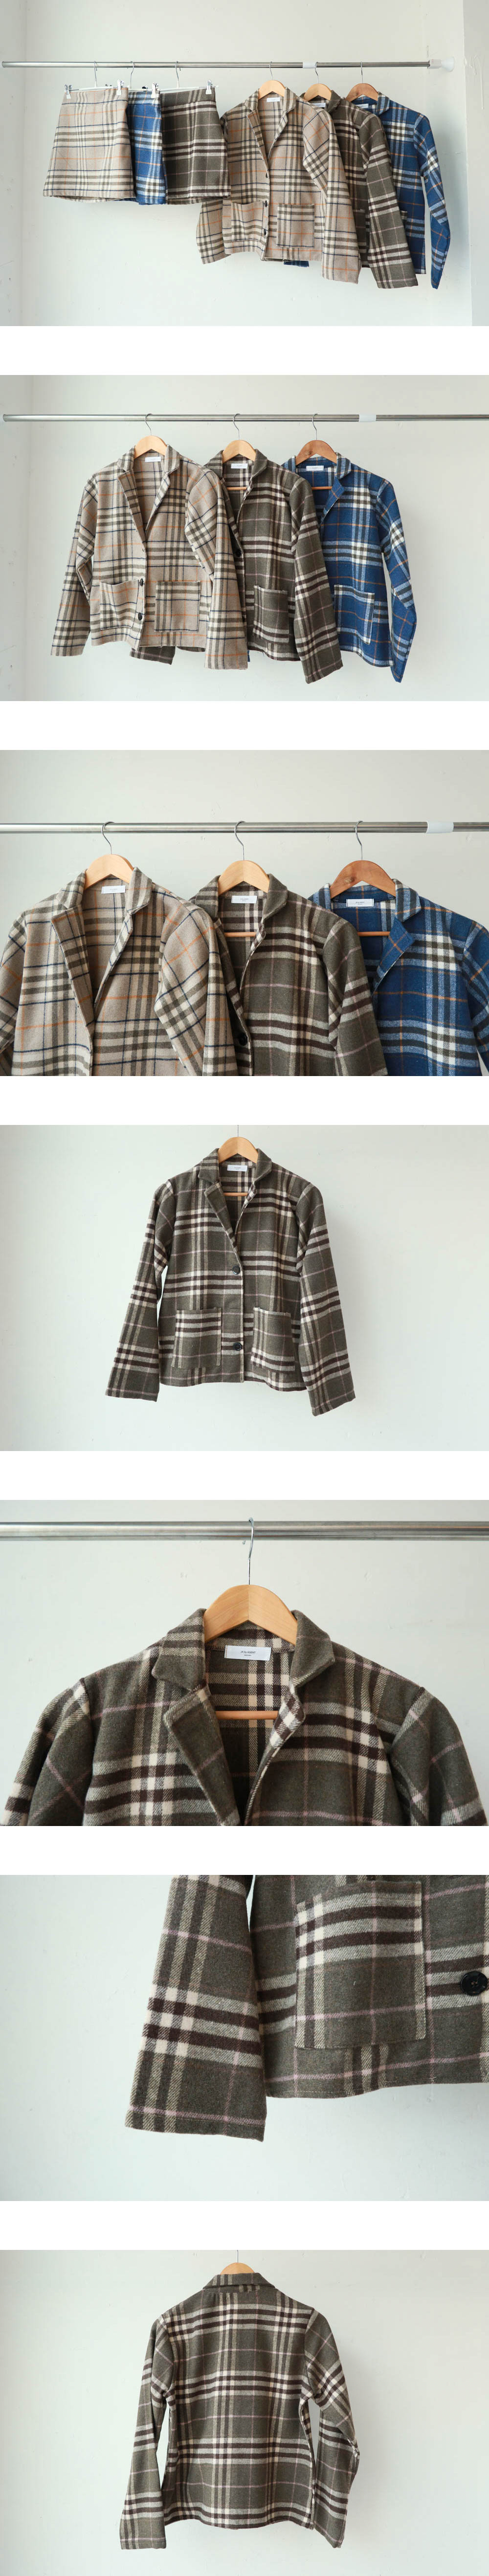 Leo check jacket (jk0071)